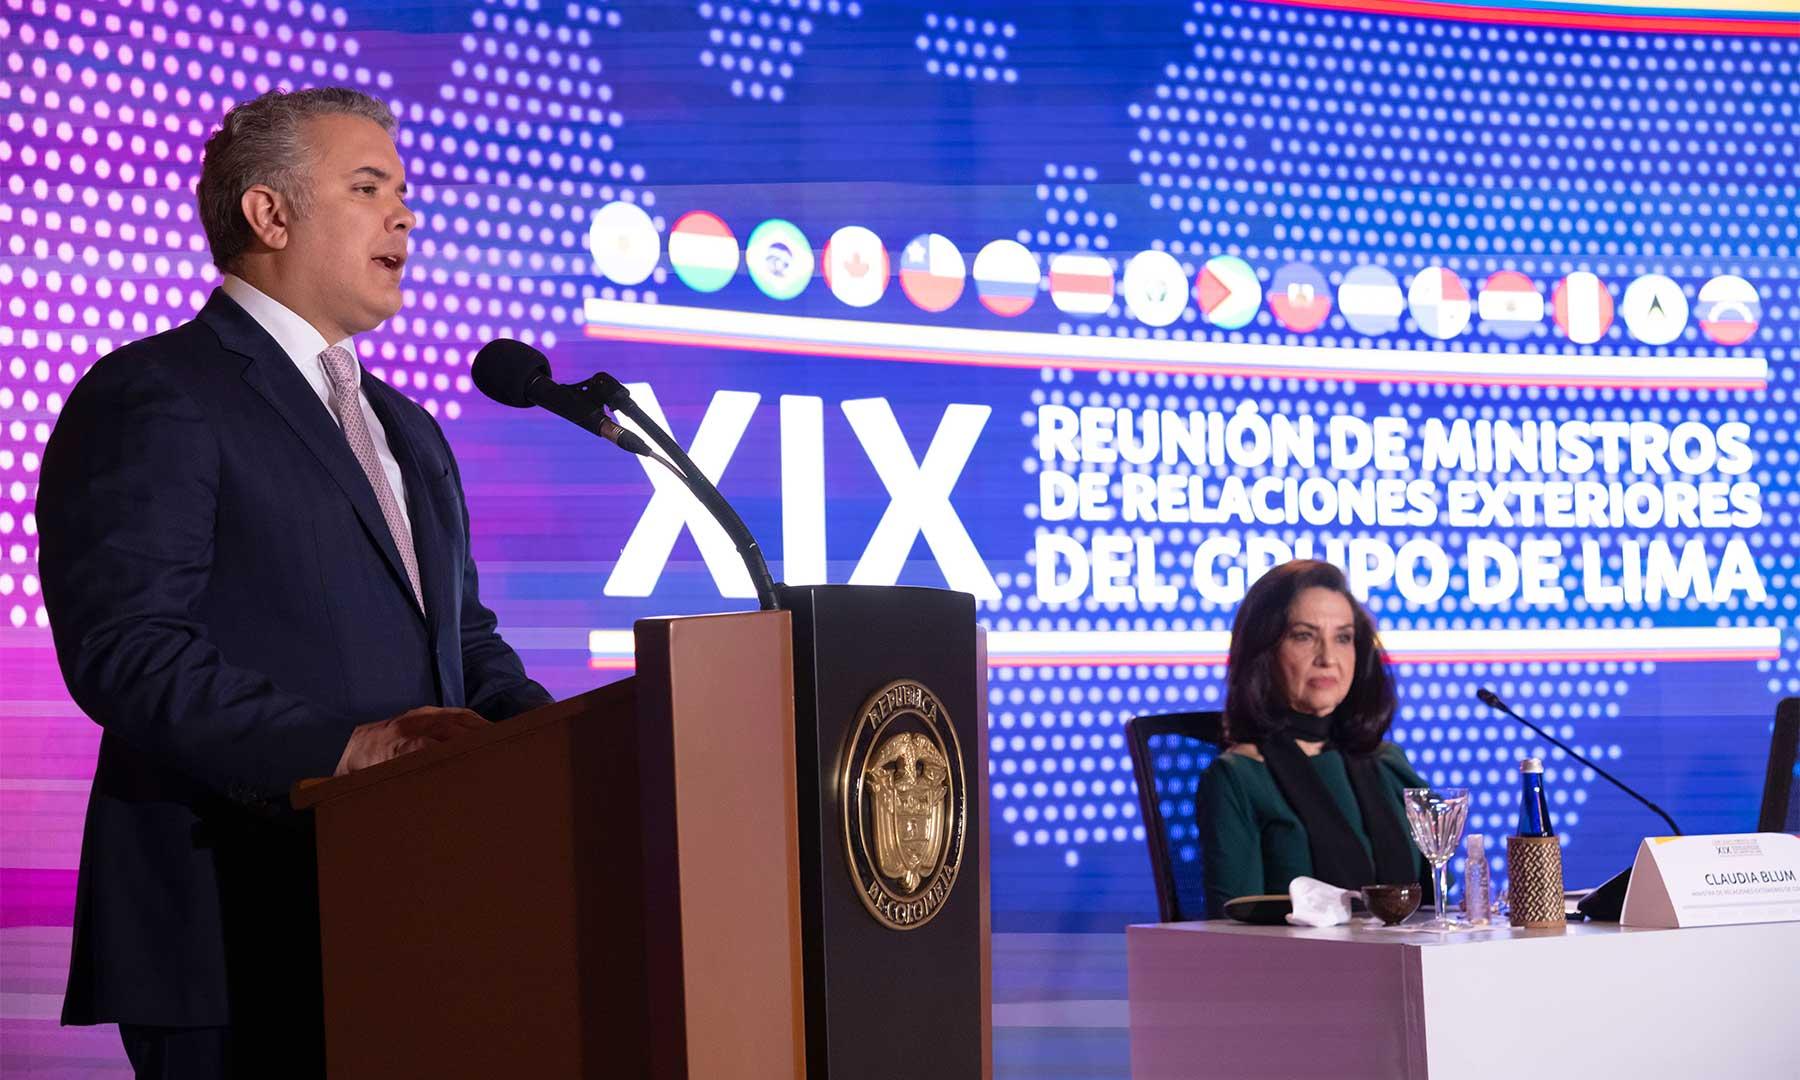 instalación, XIX Reunión de Ministros de Relaciones Exteriores, Grupo de Lima, democracia, dictadura, diplomacia, libertad, Vene